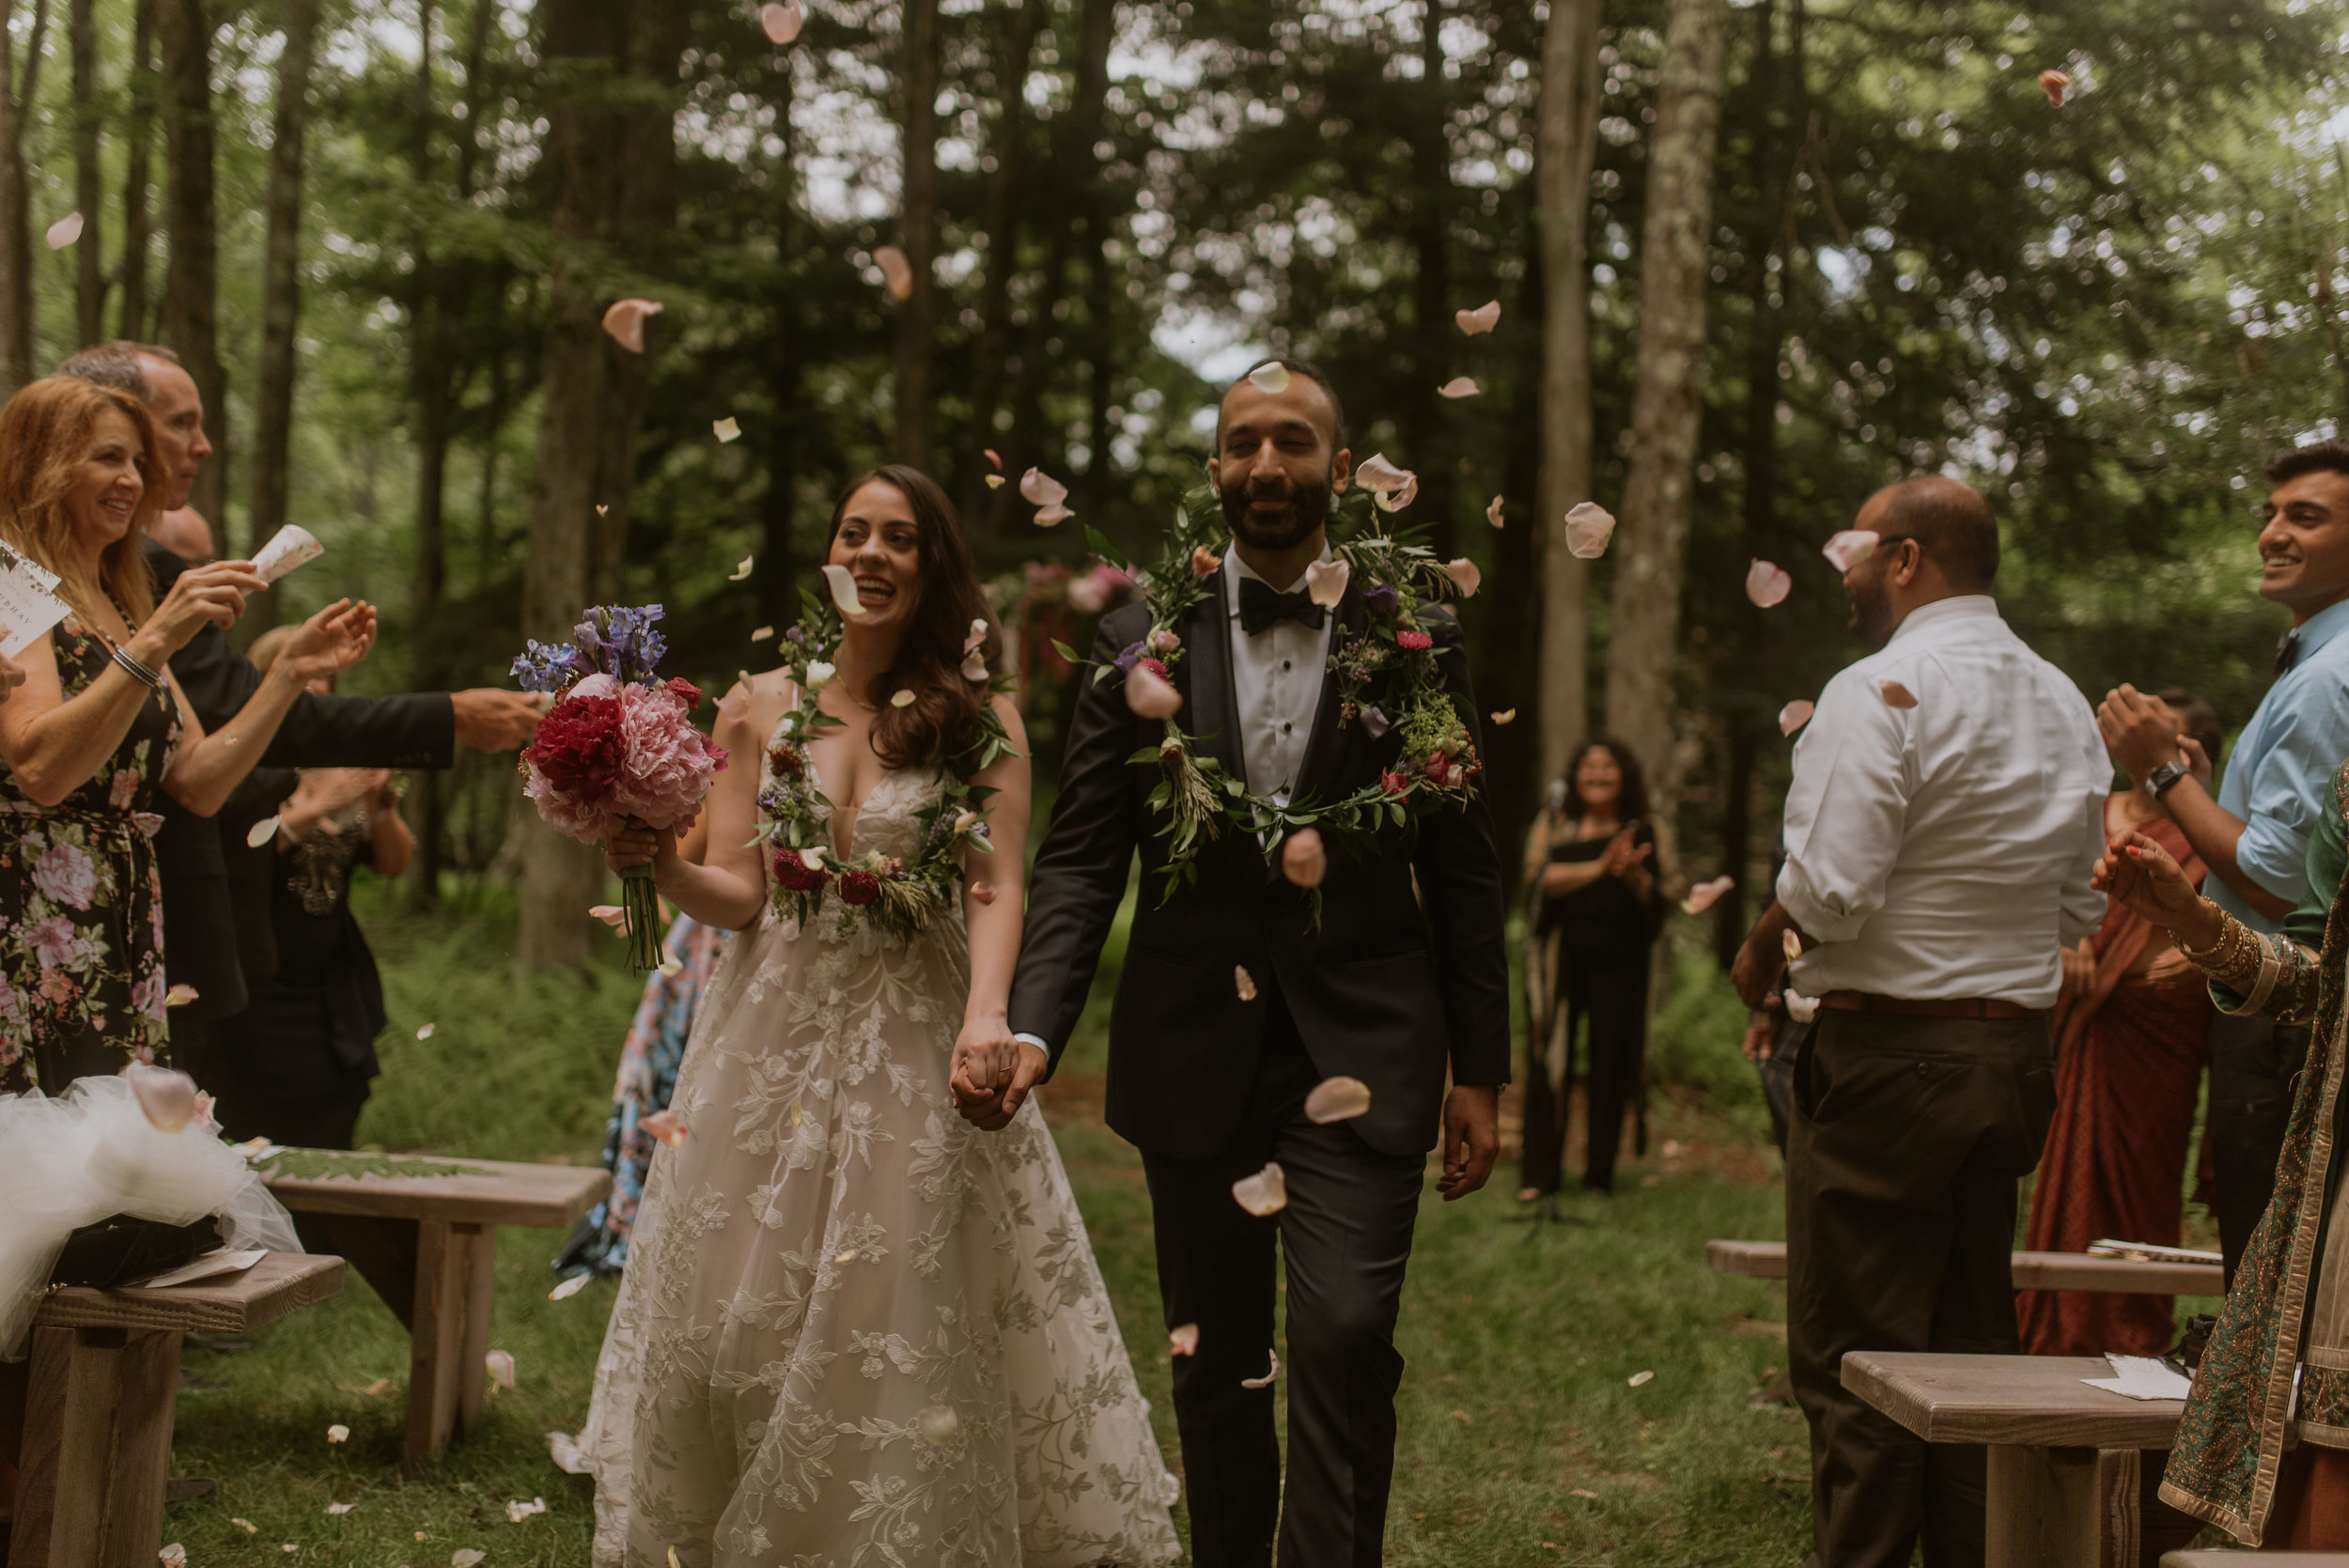 Cassandra-Anu-Wedding-Upstate-Catskills-Summer-Meadowlark-Stills-Lawrence-Braun-FINAL-0541.jpg